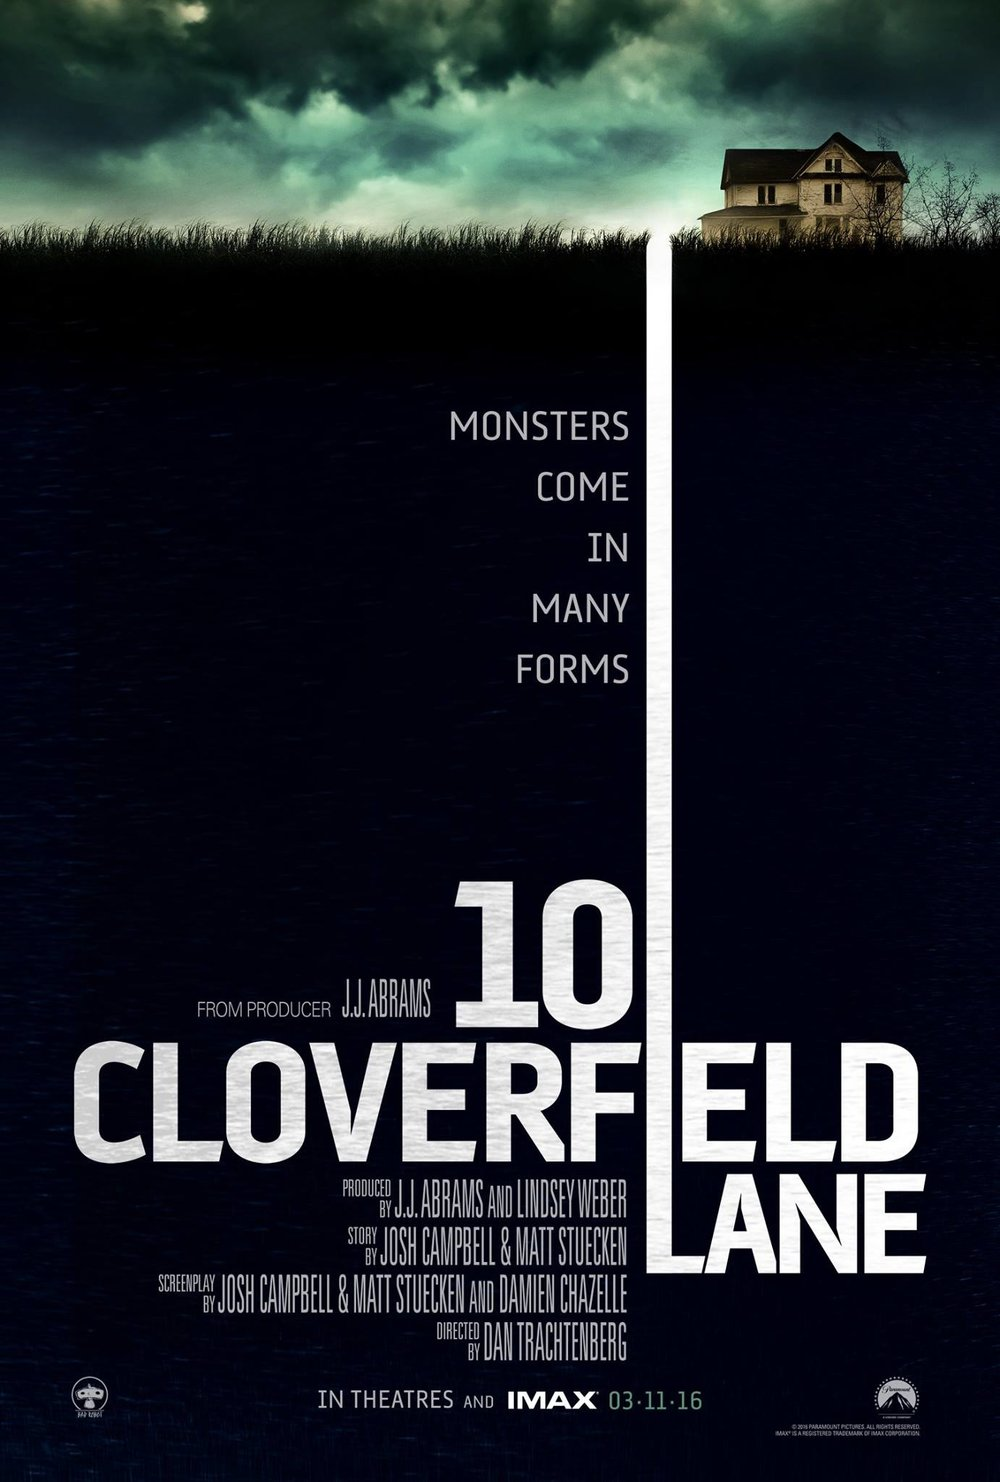 10-cloverfield-lane.jpg